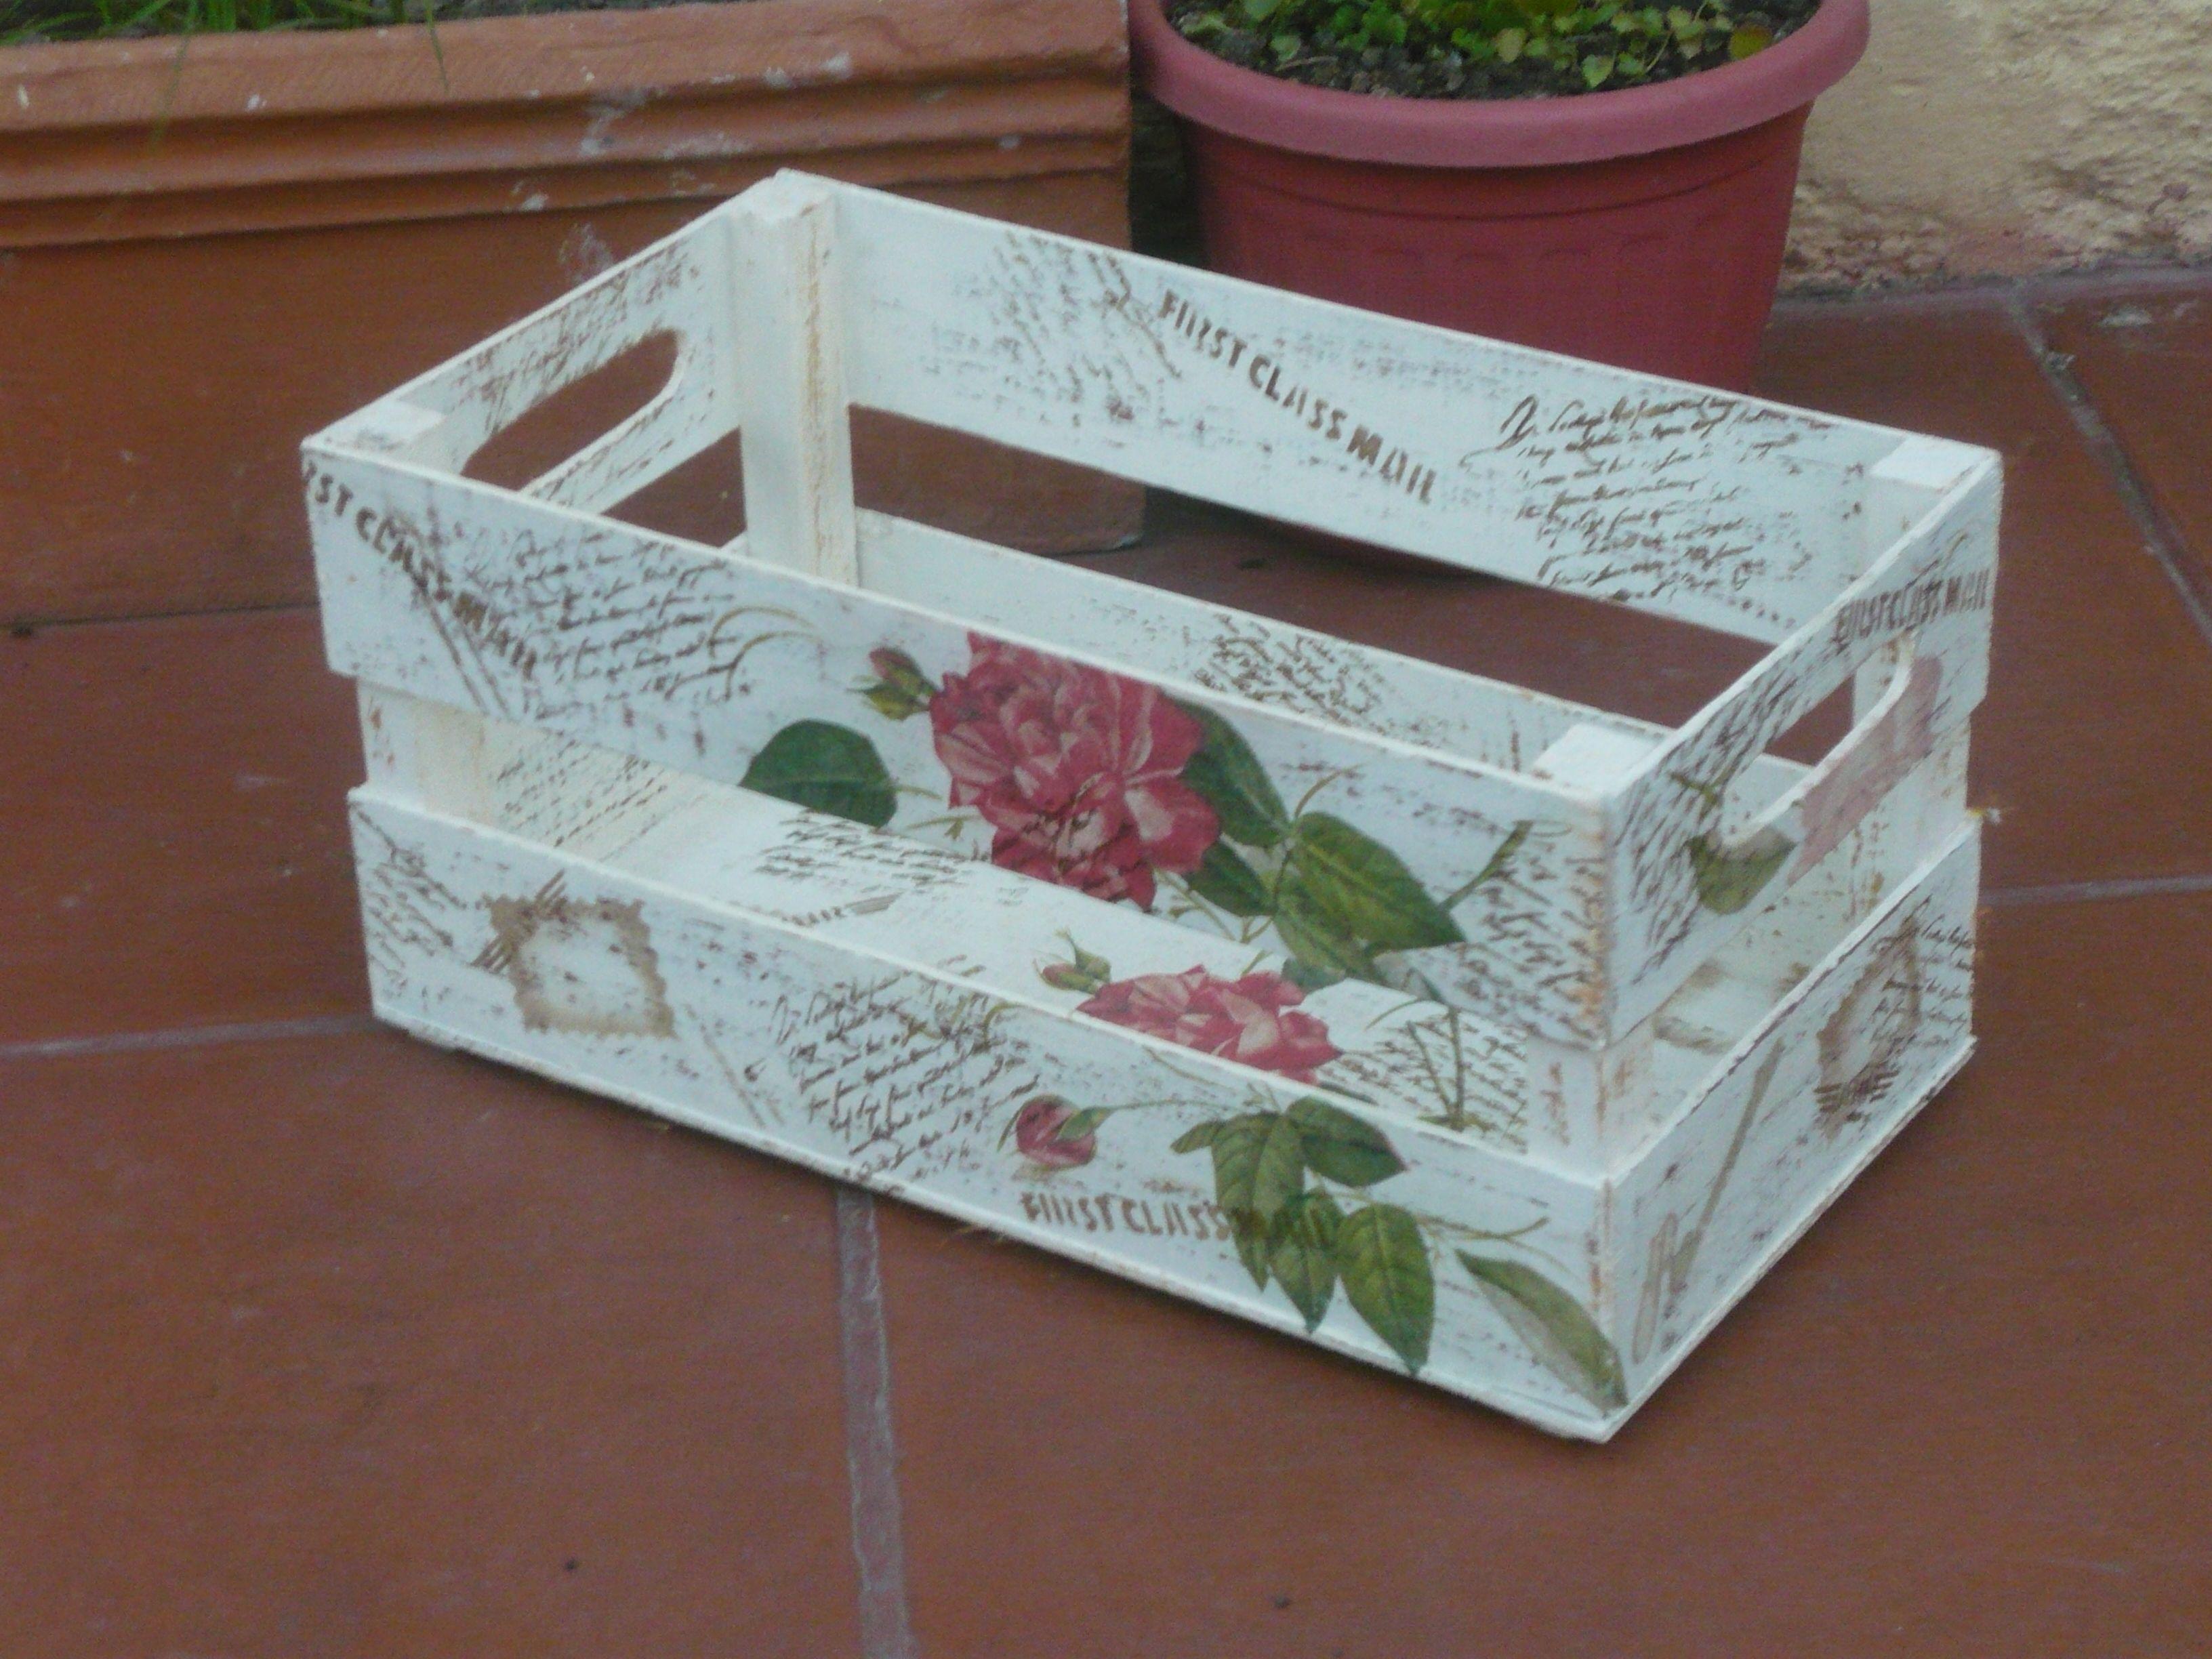 Cajoncito Rustico Cajas Decoradas Cajones De Madera Pintados Cajas De Madera